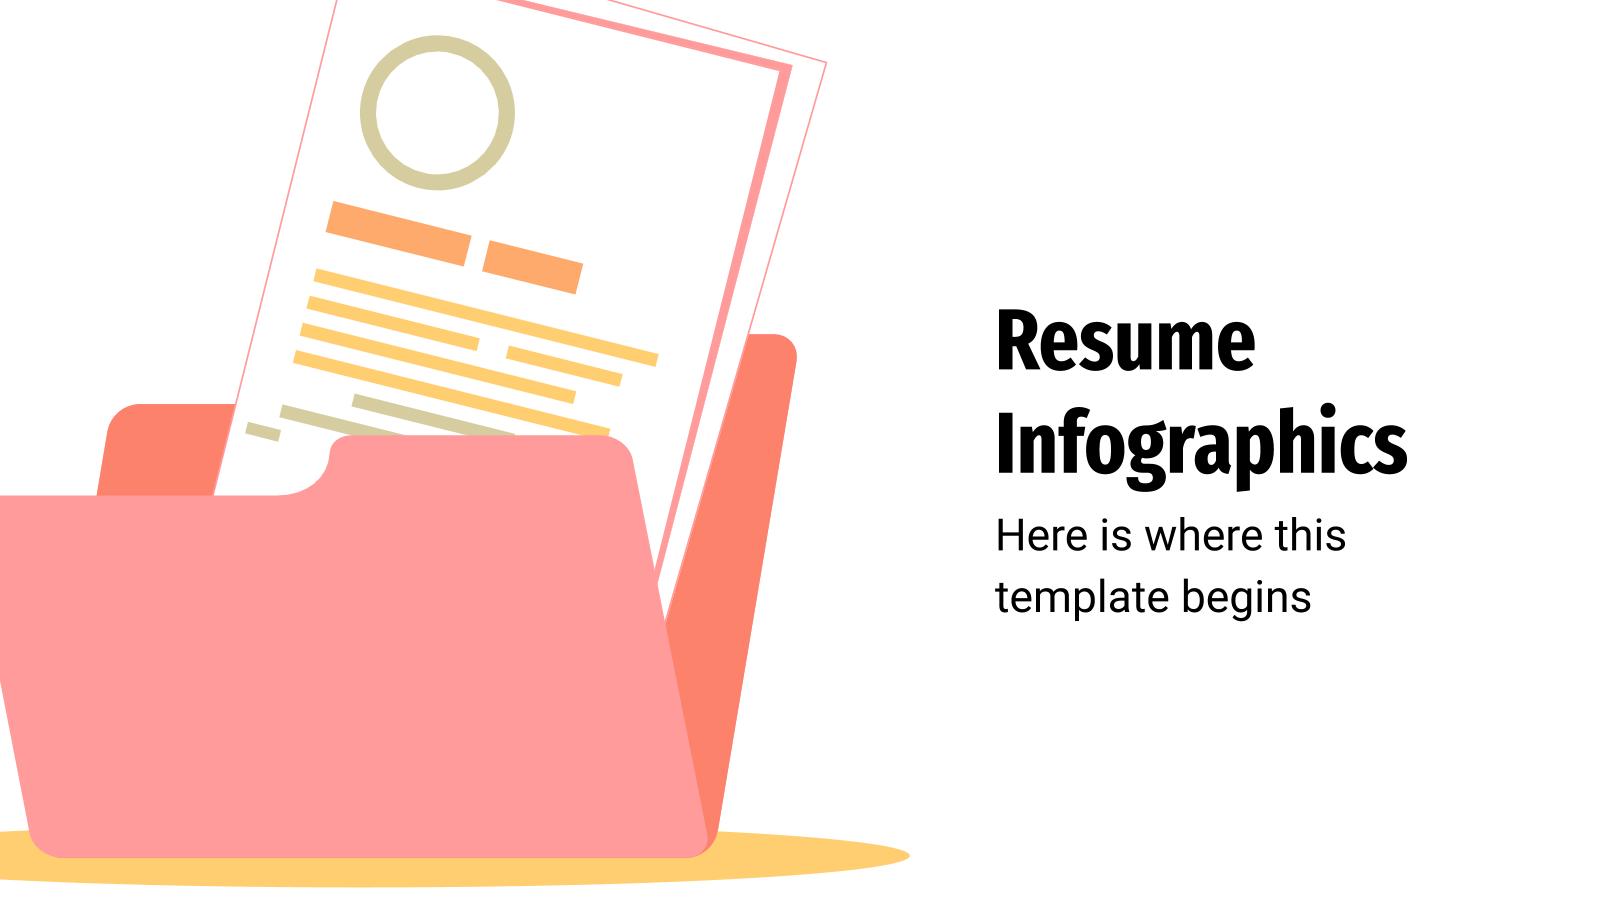 Resume Infographics presentation template